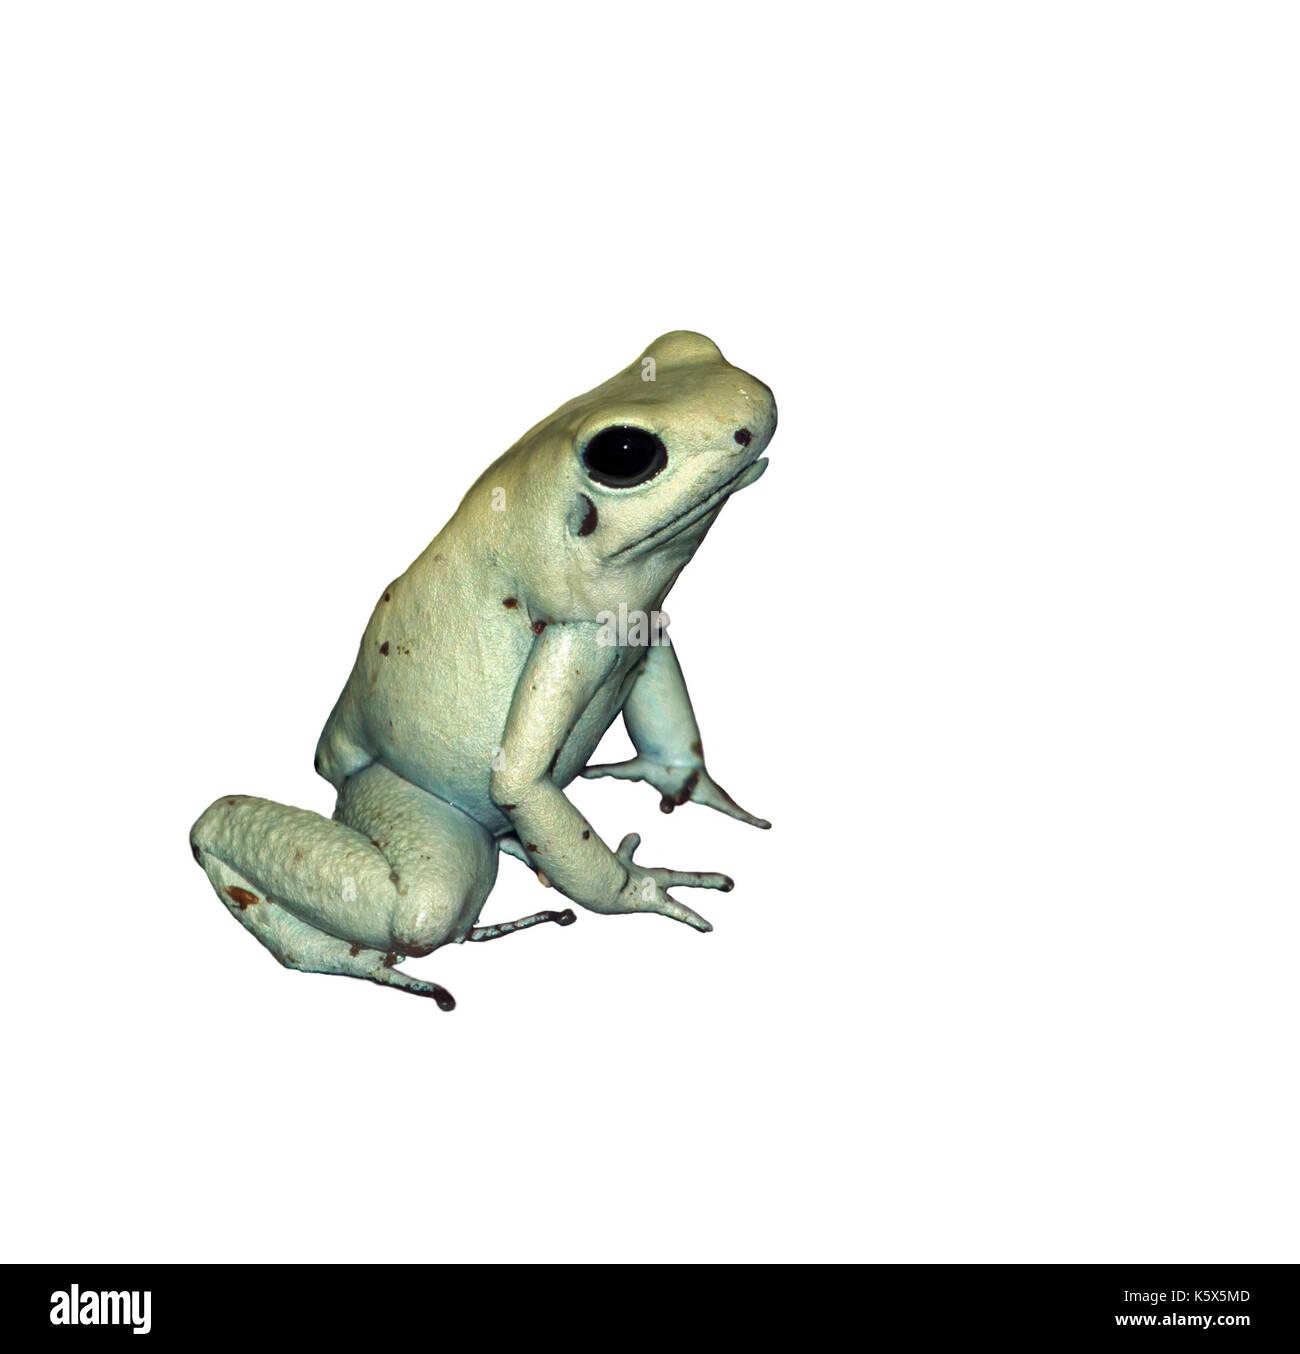 Dyeing poison dart frog isolated on white - Stock Image